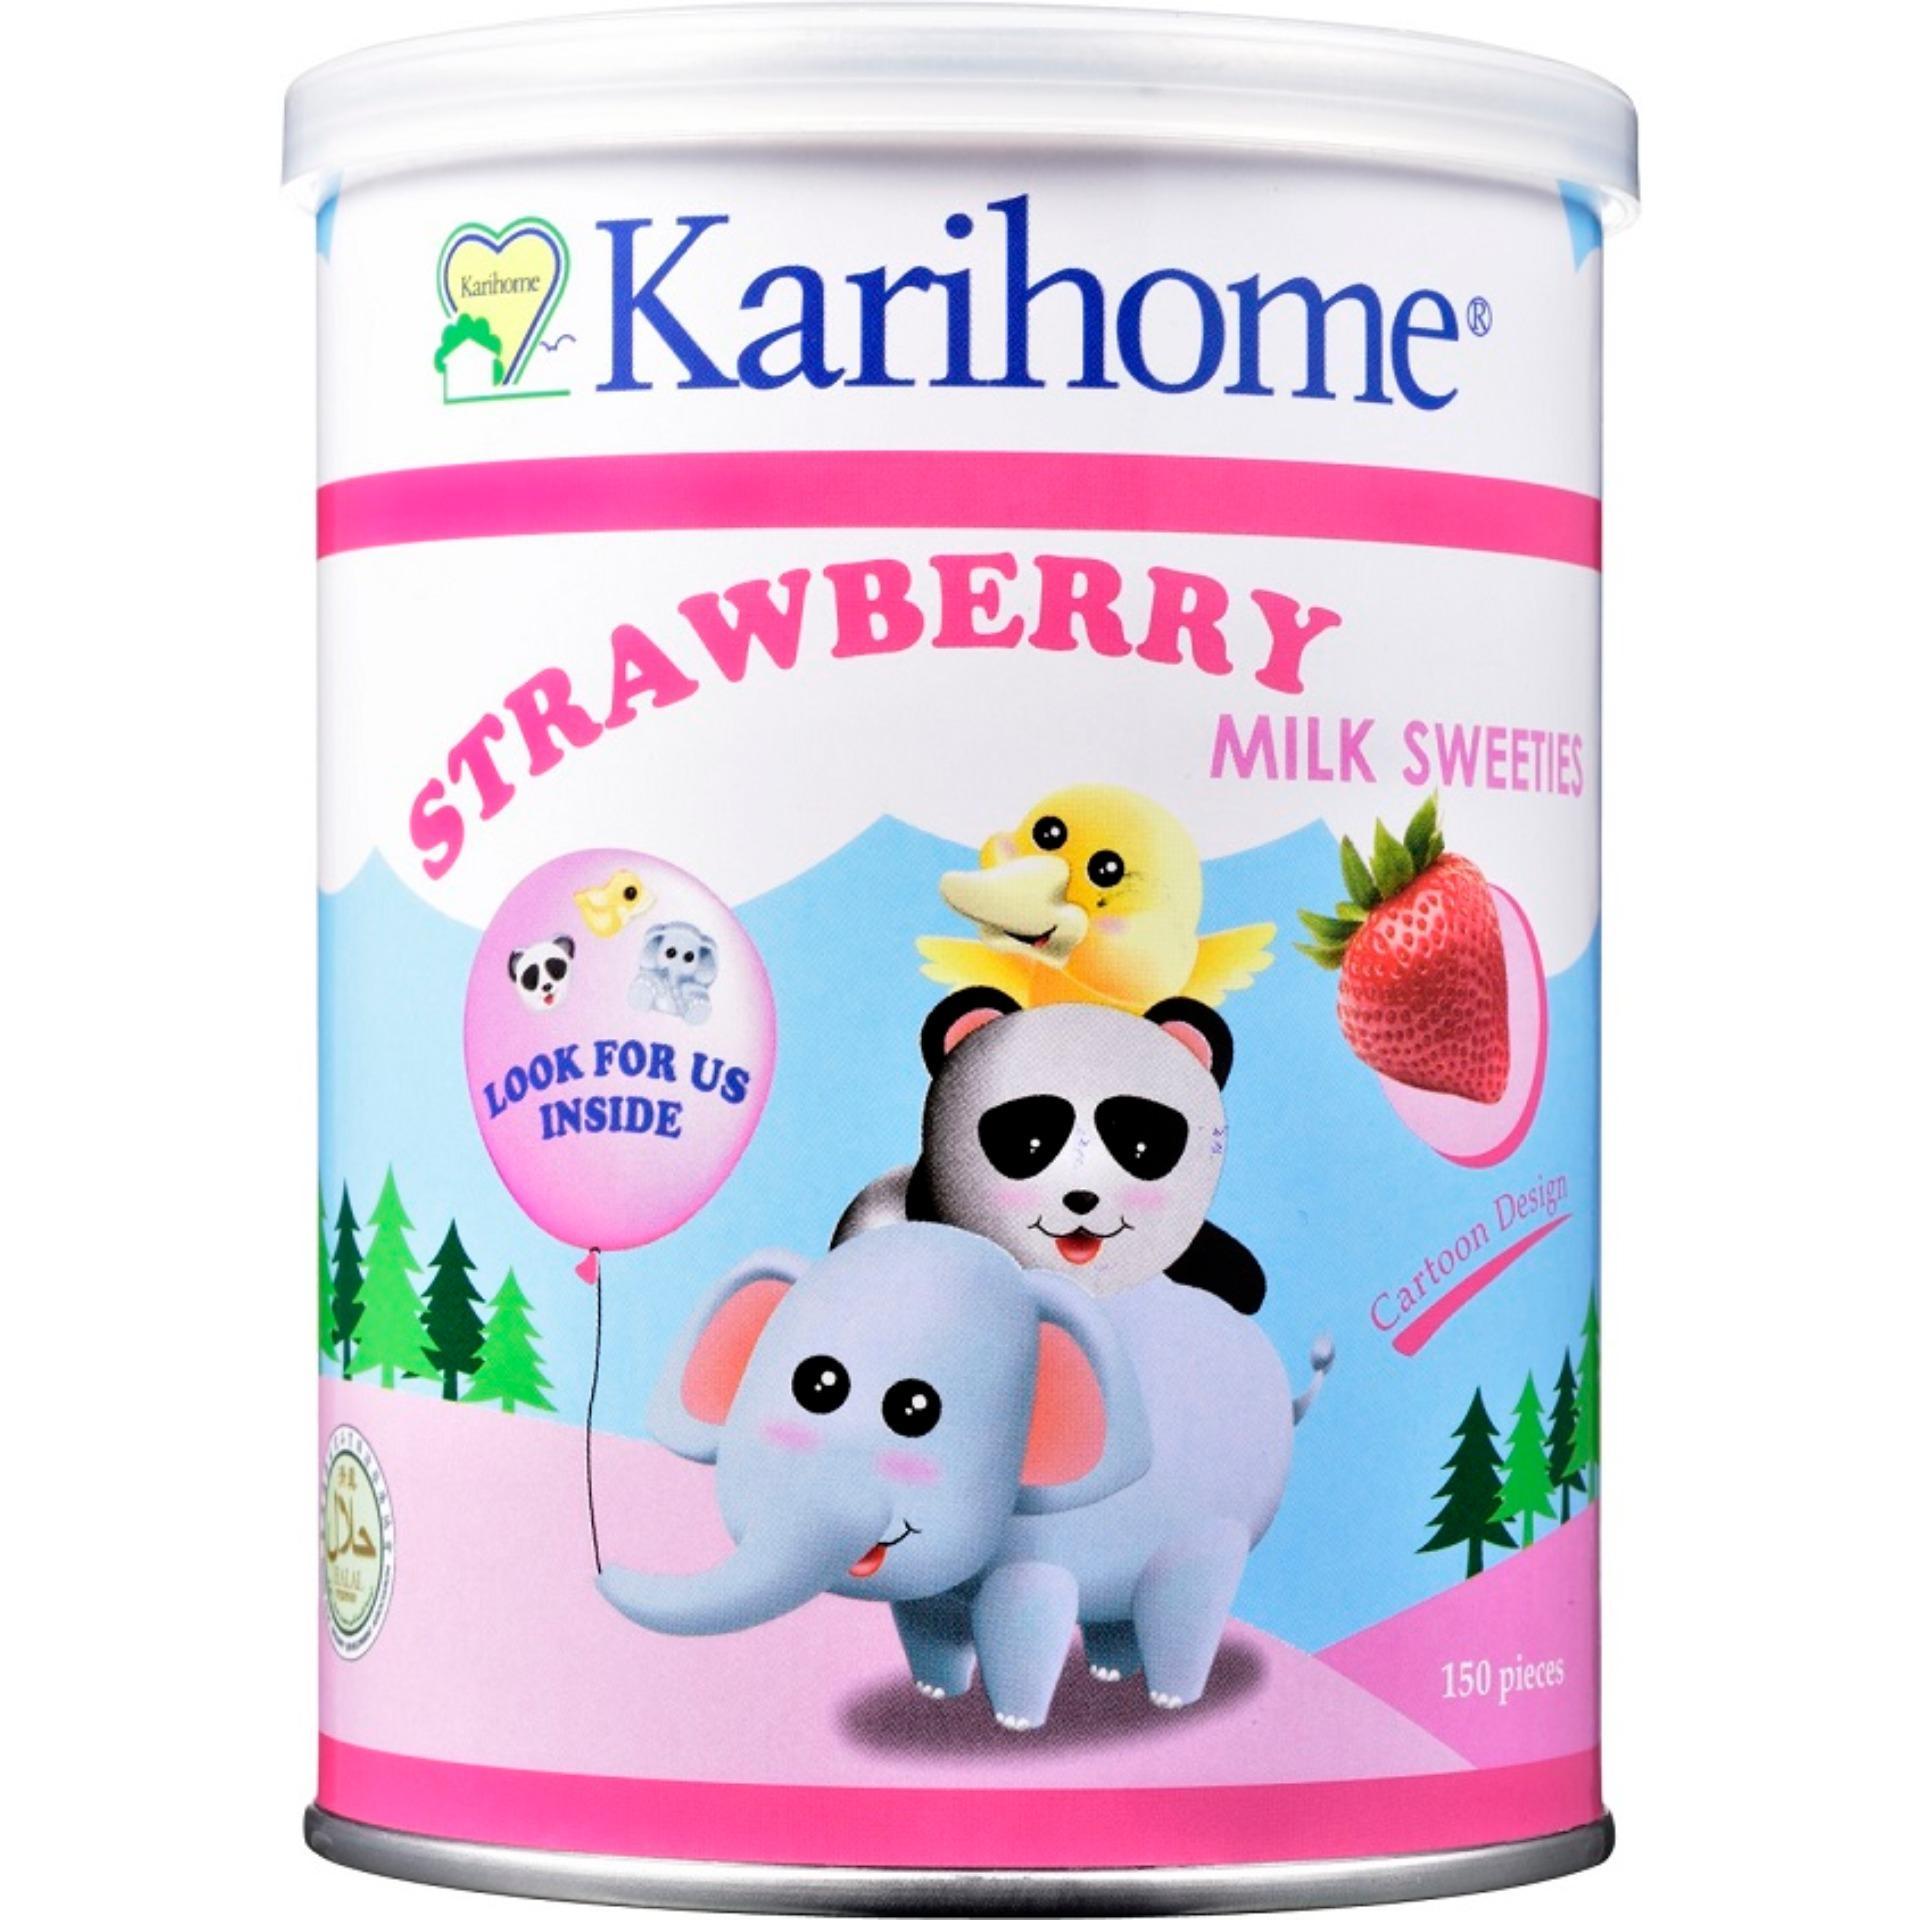 Karihome Sweeties - Strawberry By Lazada Retail Karihome Flagship Store.